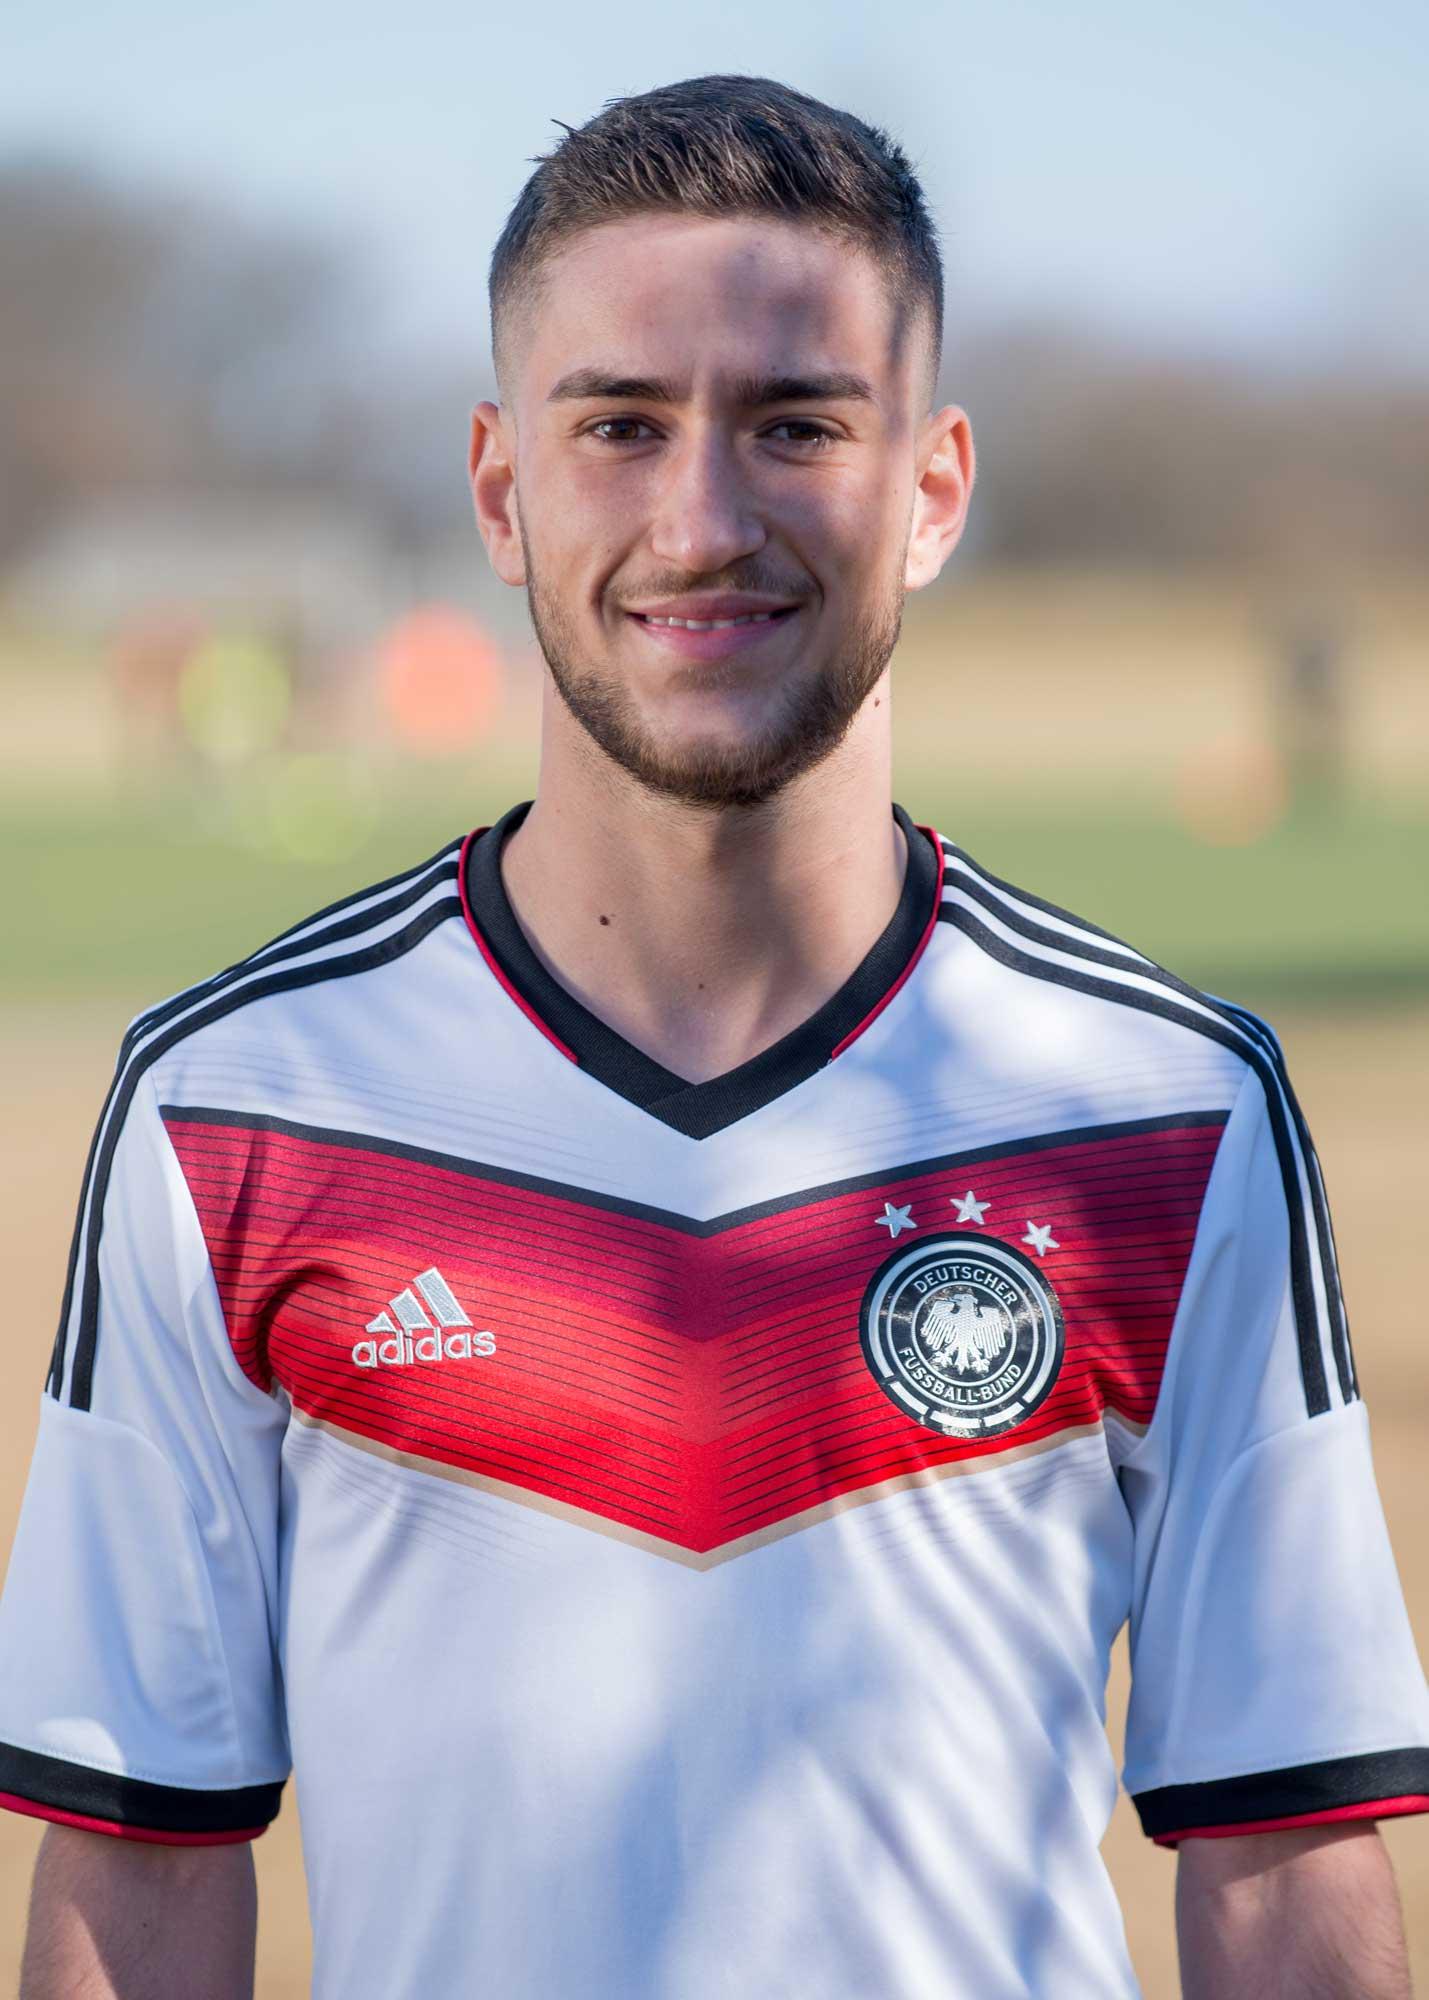 Patrick D. - 173cm  Bayernliga  München